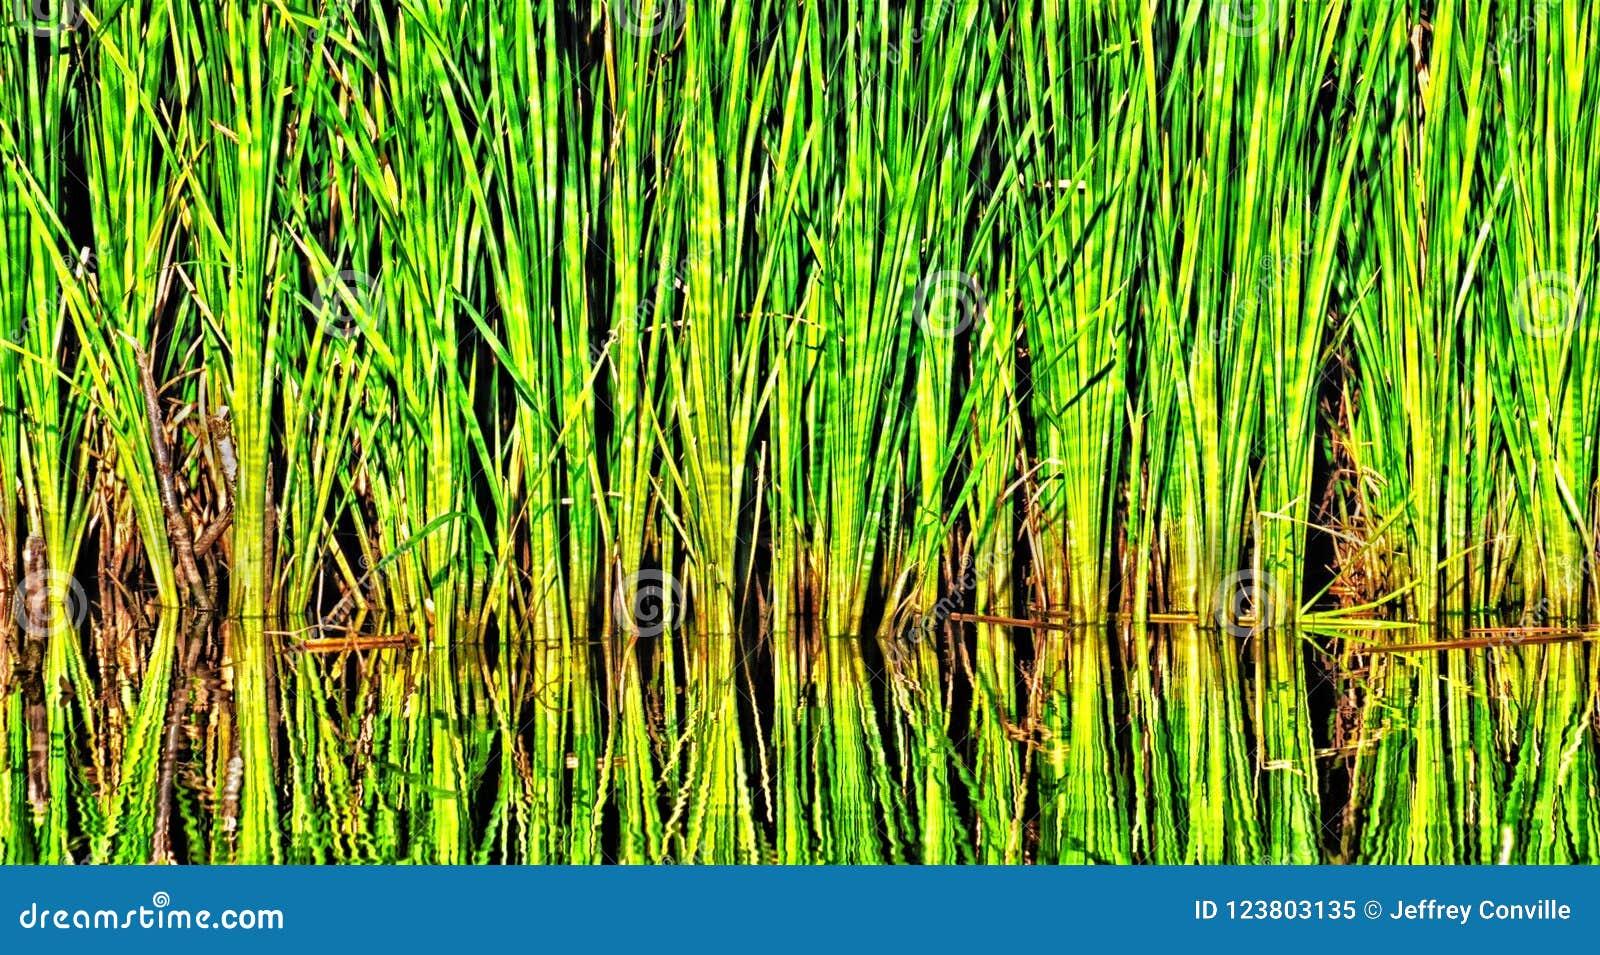 Weeds near a pond